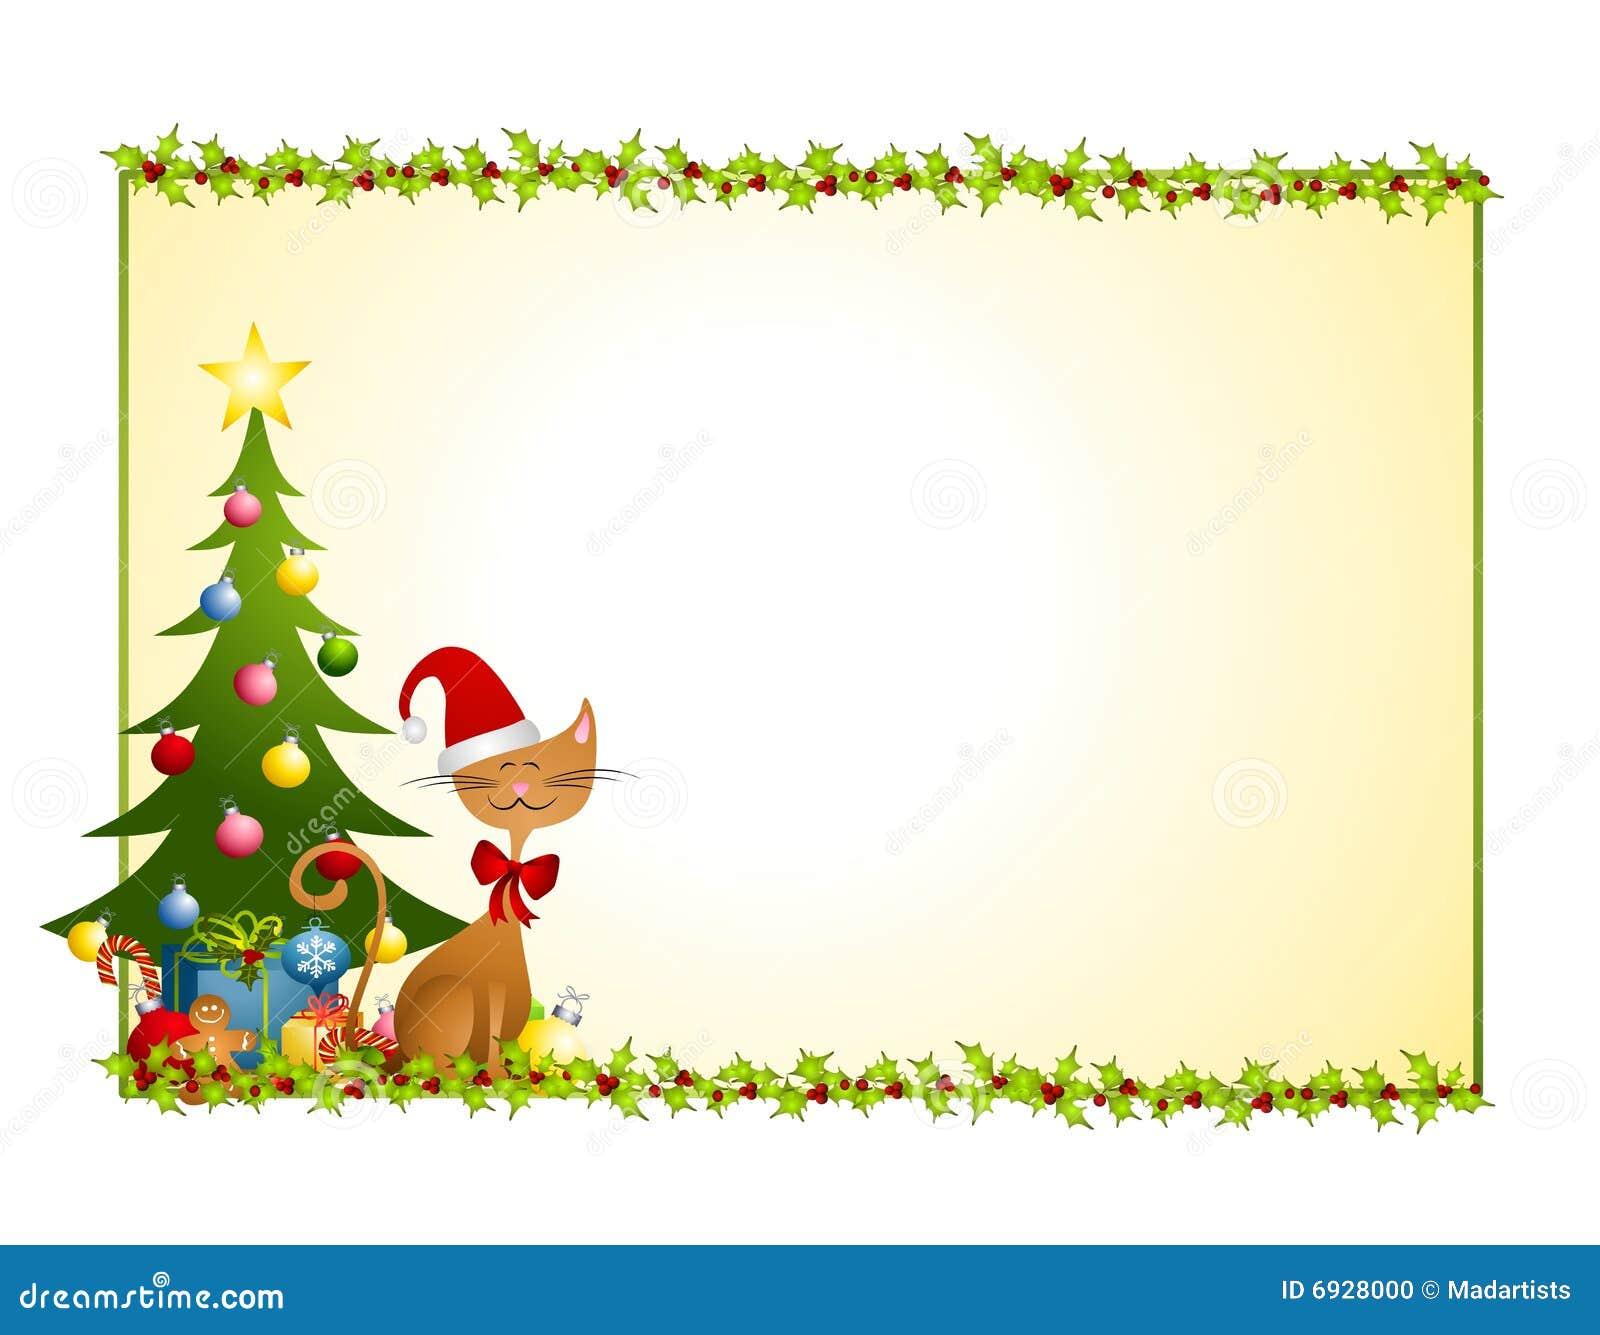 free christmas kitten clipart - photo #42